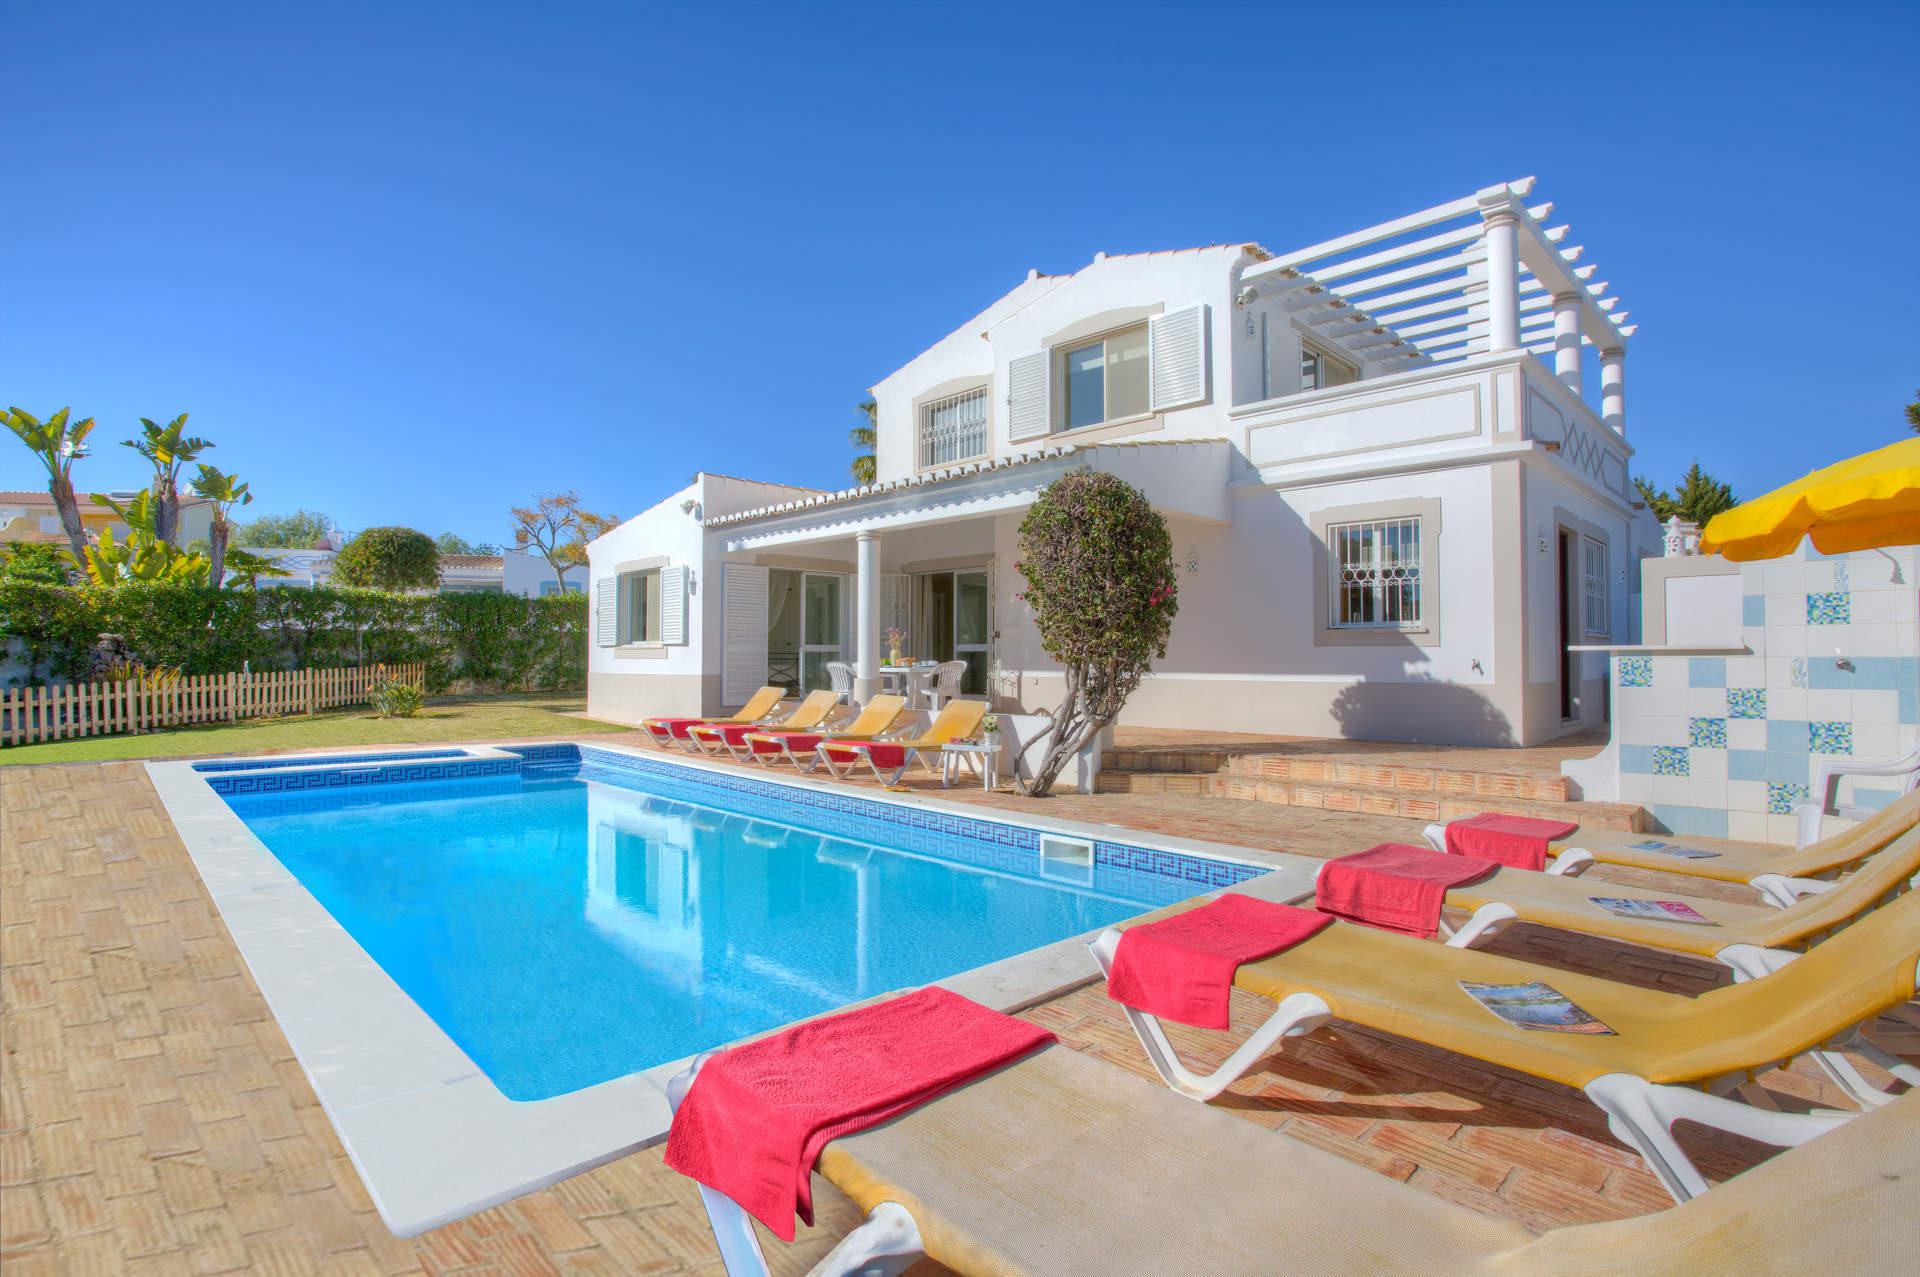 Villa Flor, Guia, Algarve, Portugal